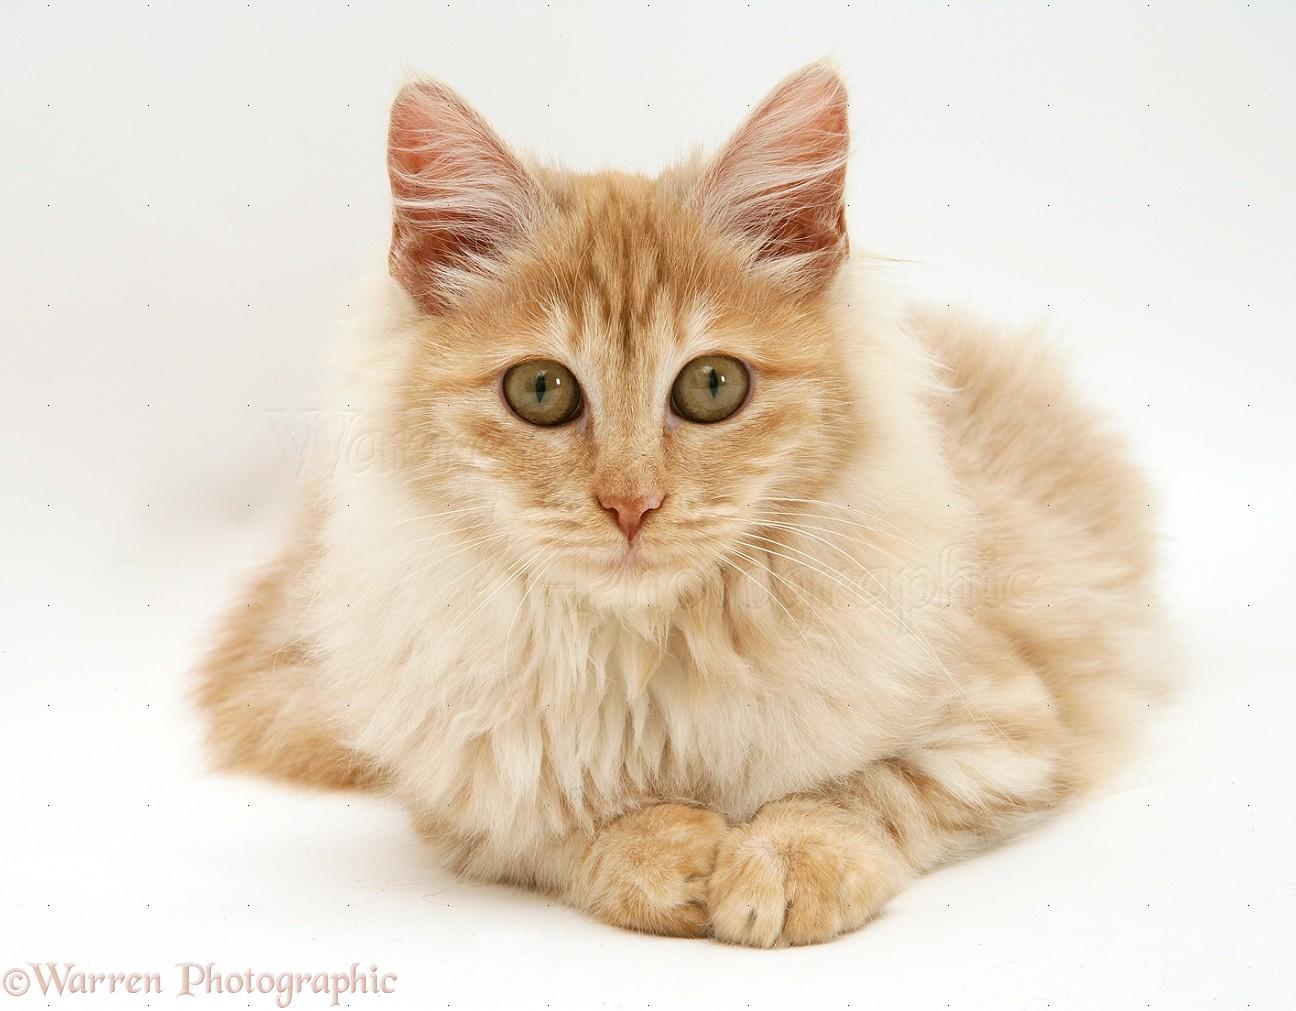 Red Silver Turkish Angora Cat Photo Wp17703